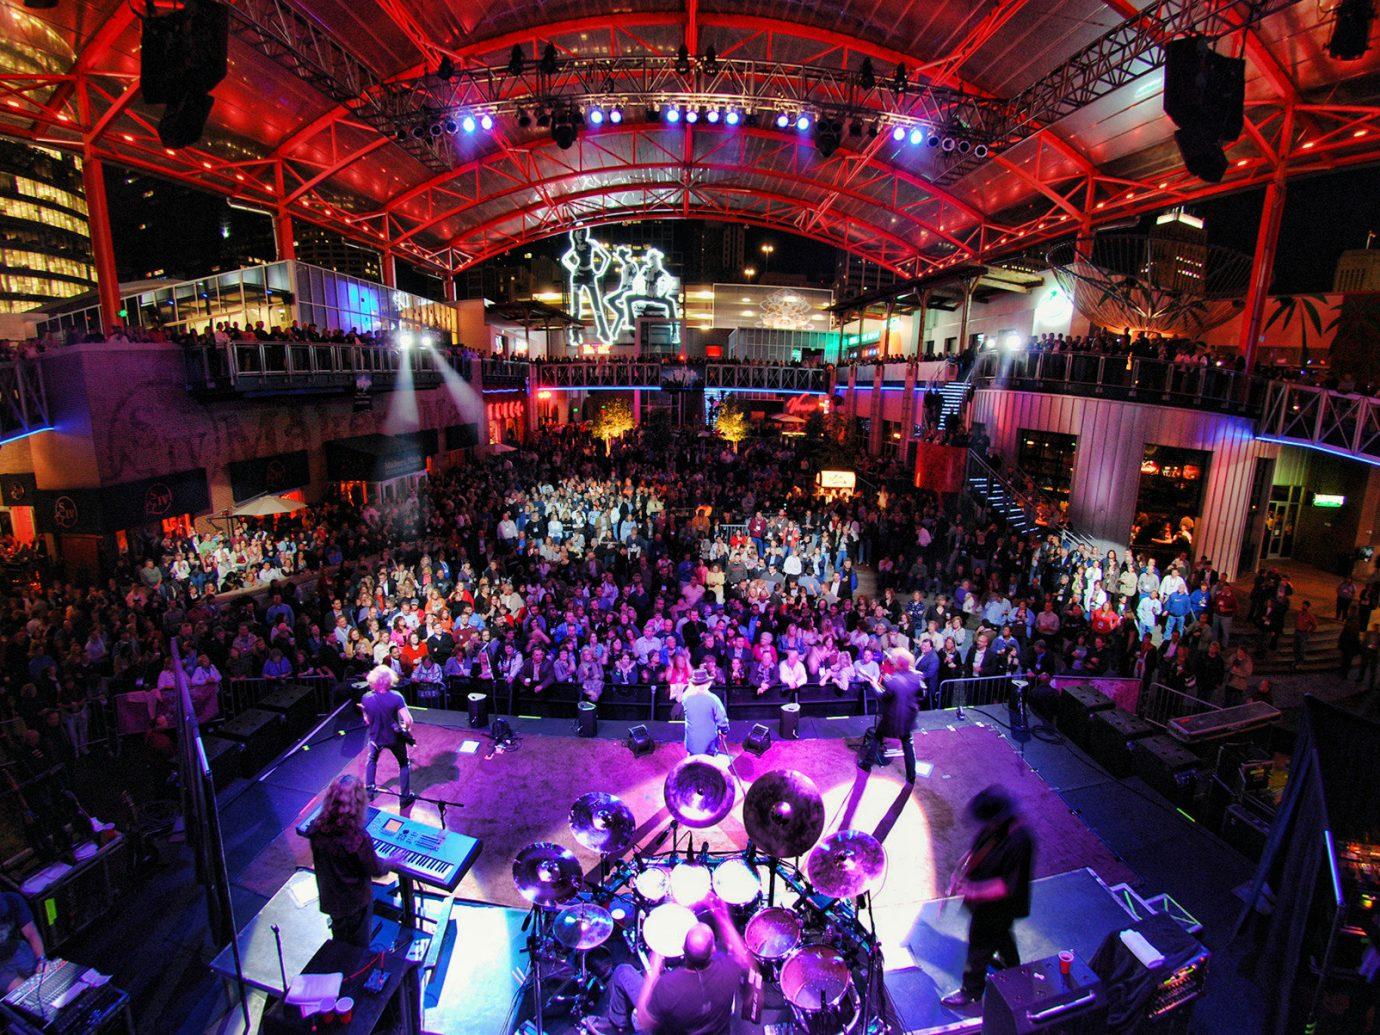 Trip Ideas crowd night nightclub stage audience musical theatre